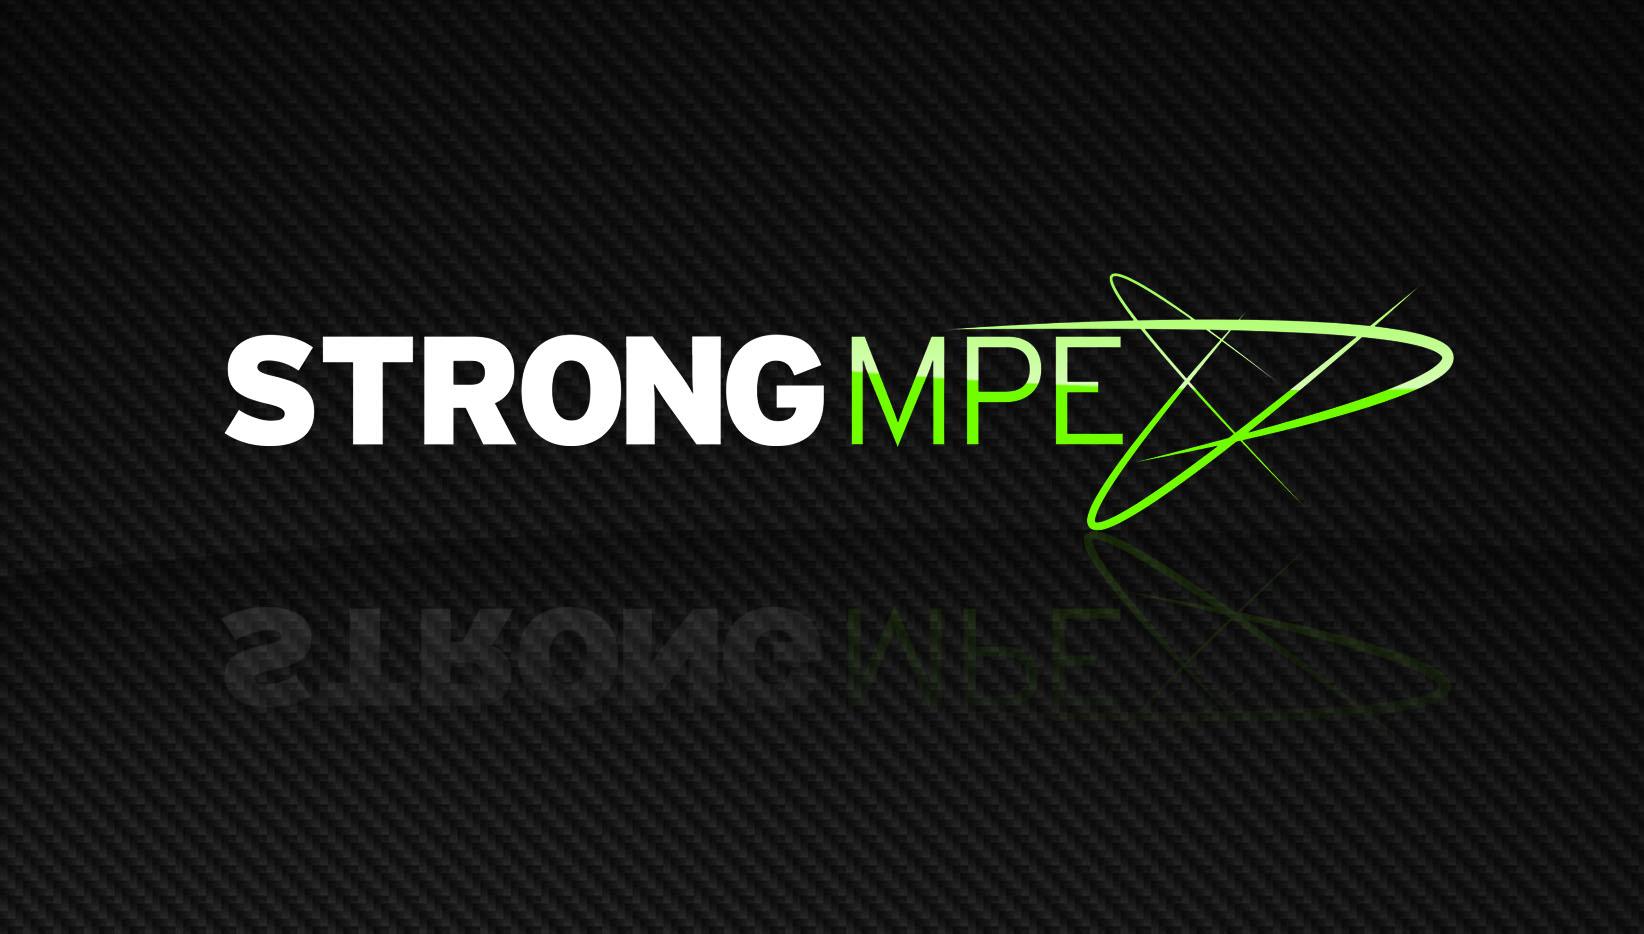 strong mpe (2).jpg